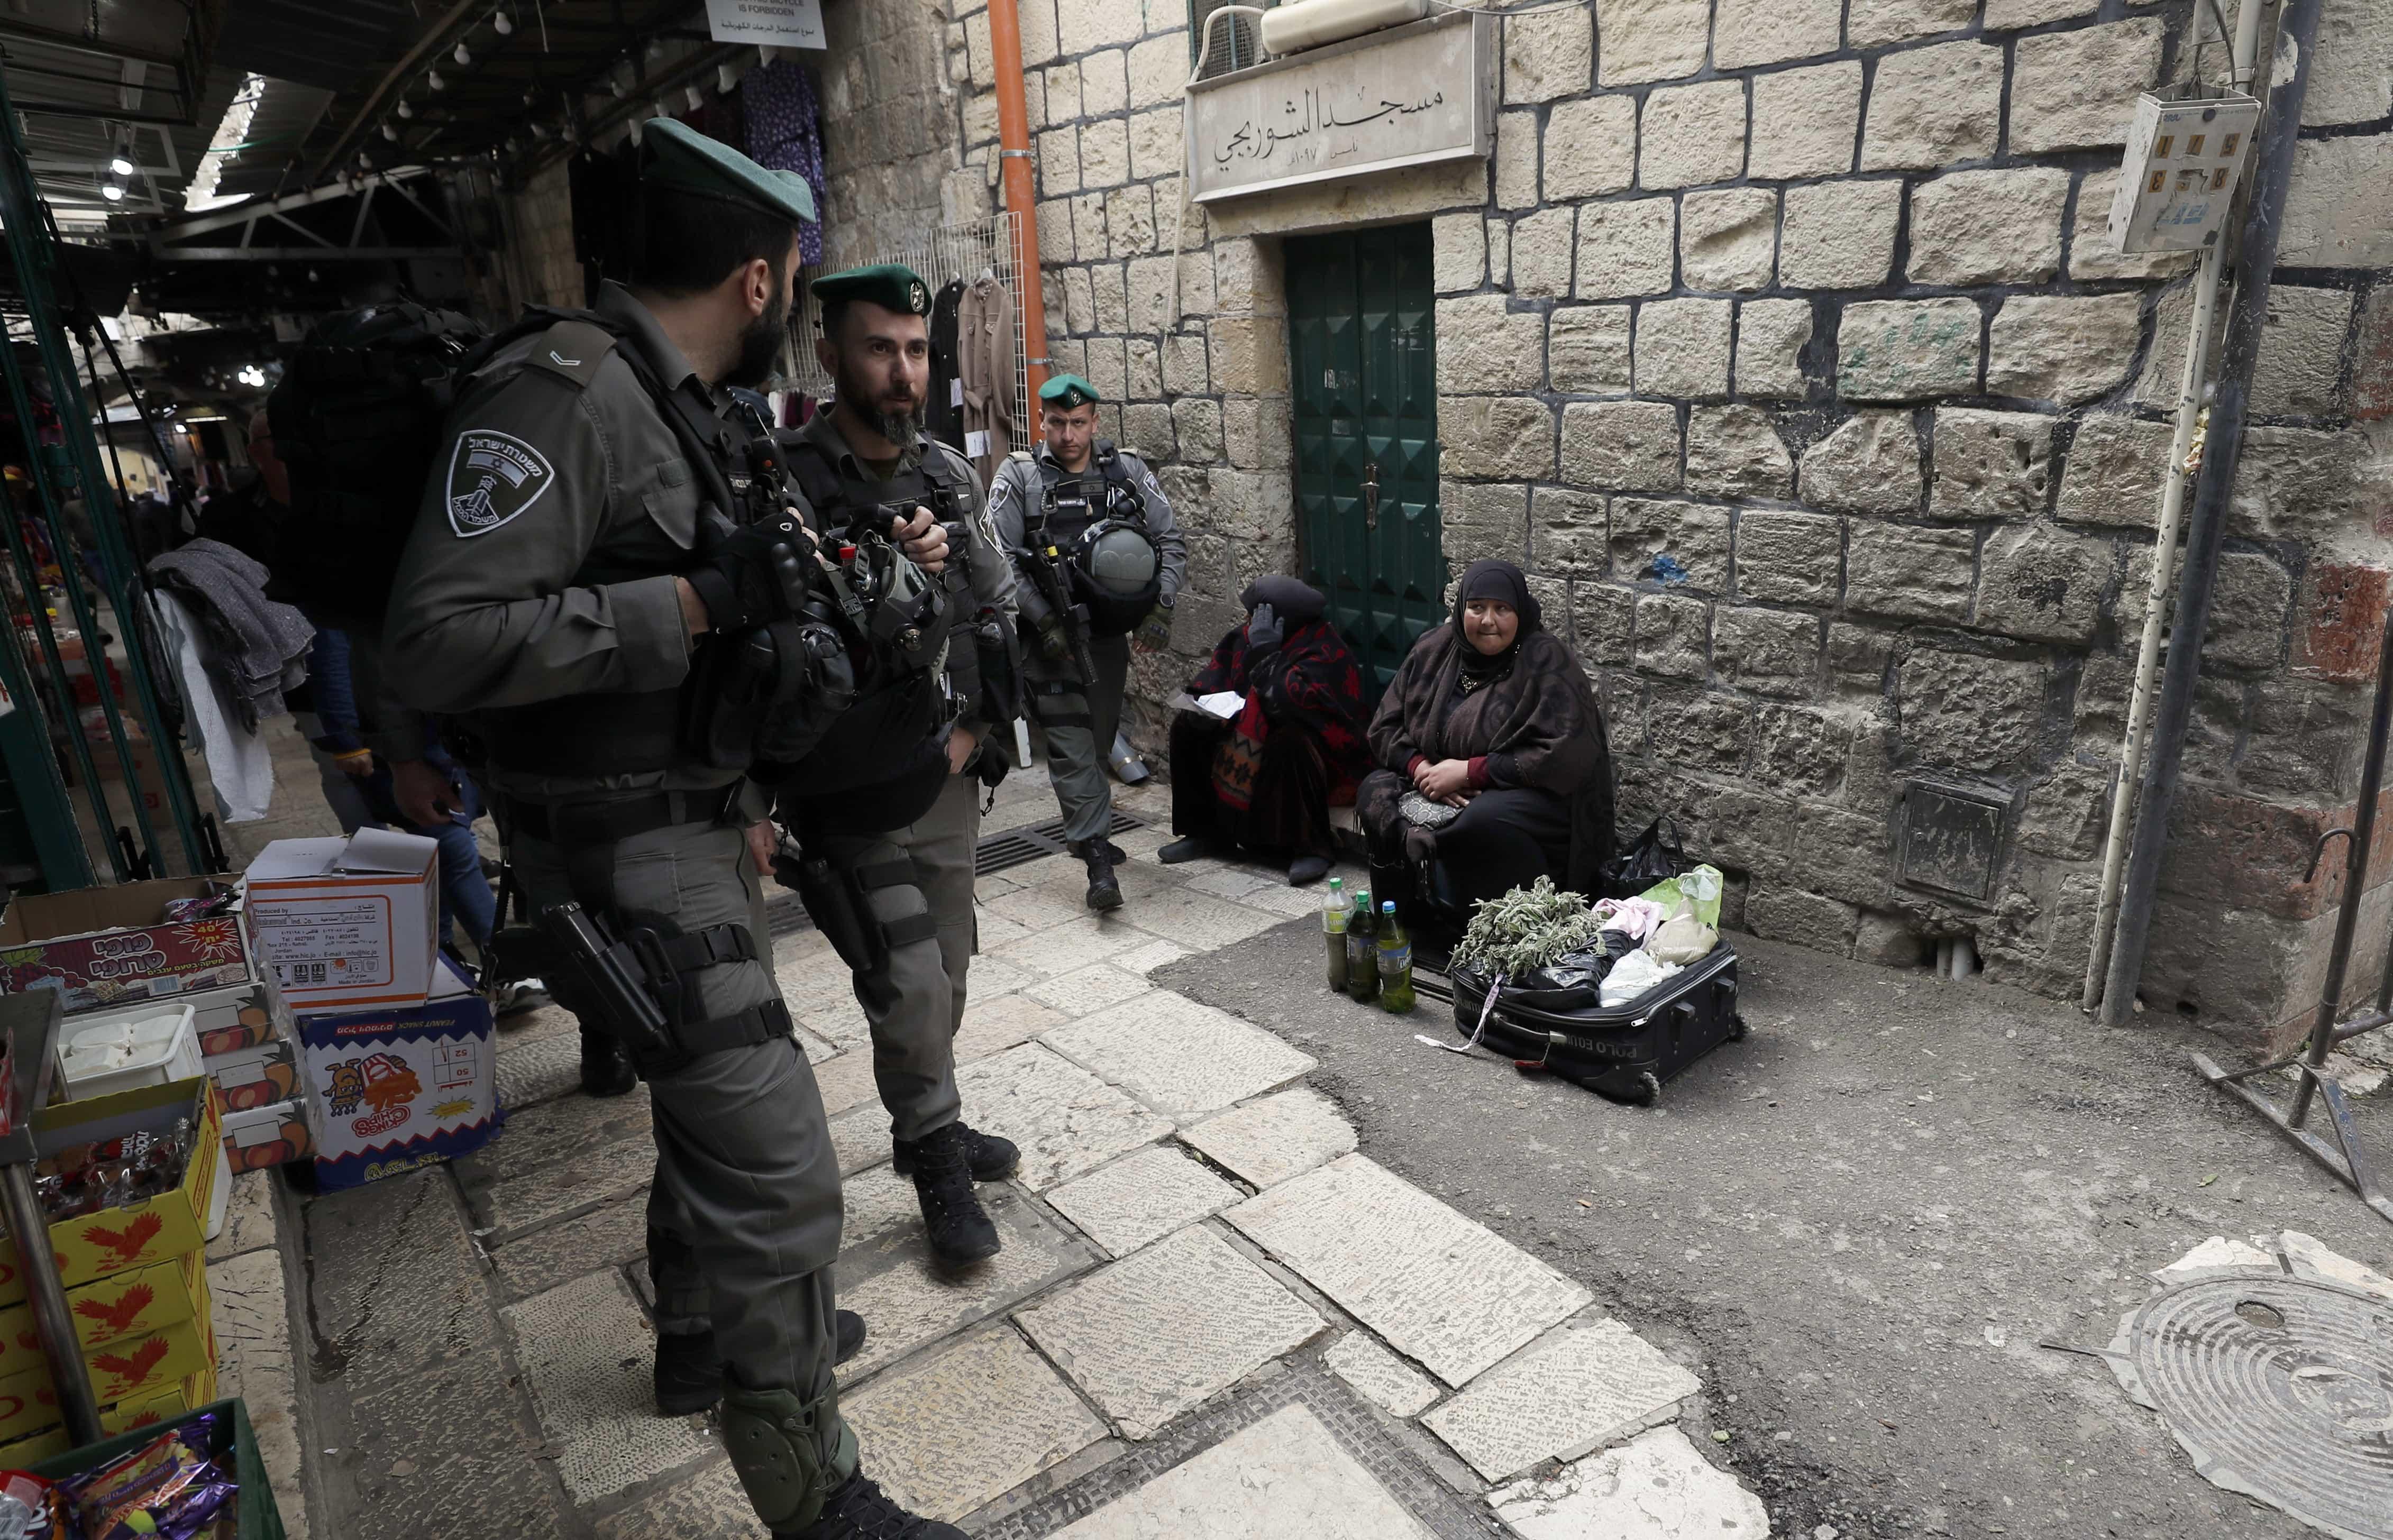 Israel ordena encerramento de edifício muçulmano em Jerusalém